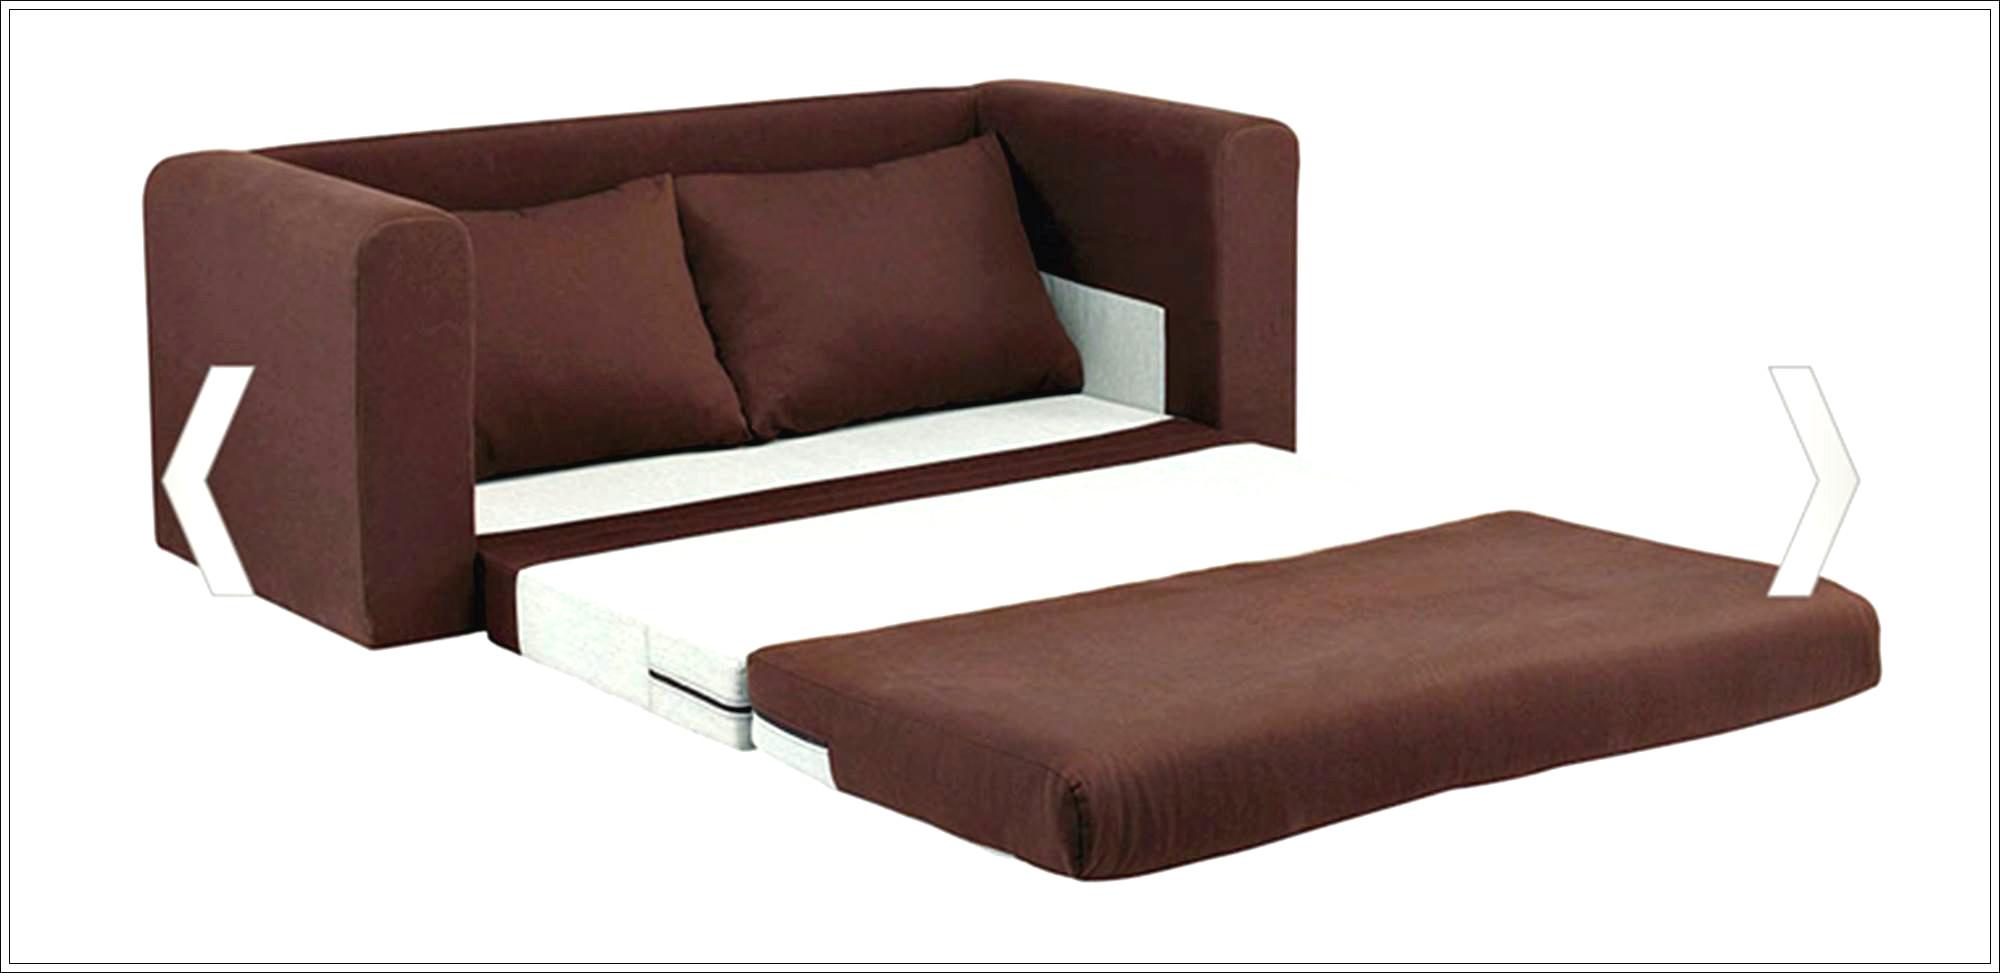 Grand Jeté De Canapé Luxe Galerie Awesome sofa 1 Place S Joshkrajcik Us Joshkrajcik Us Avec